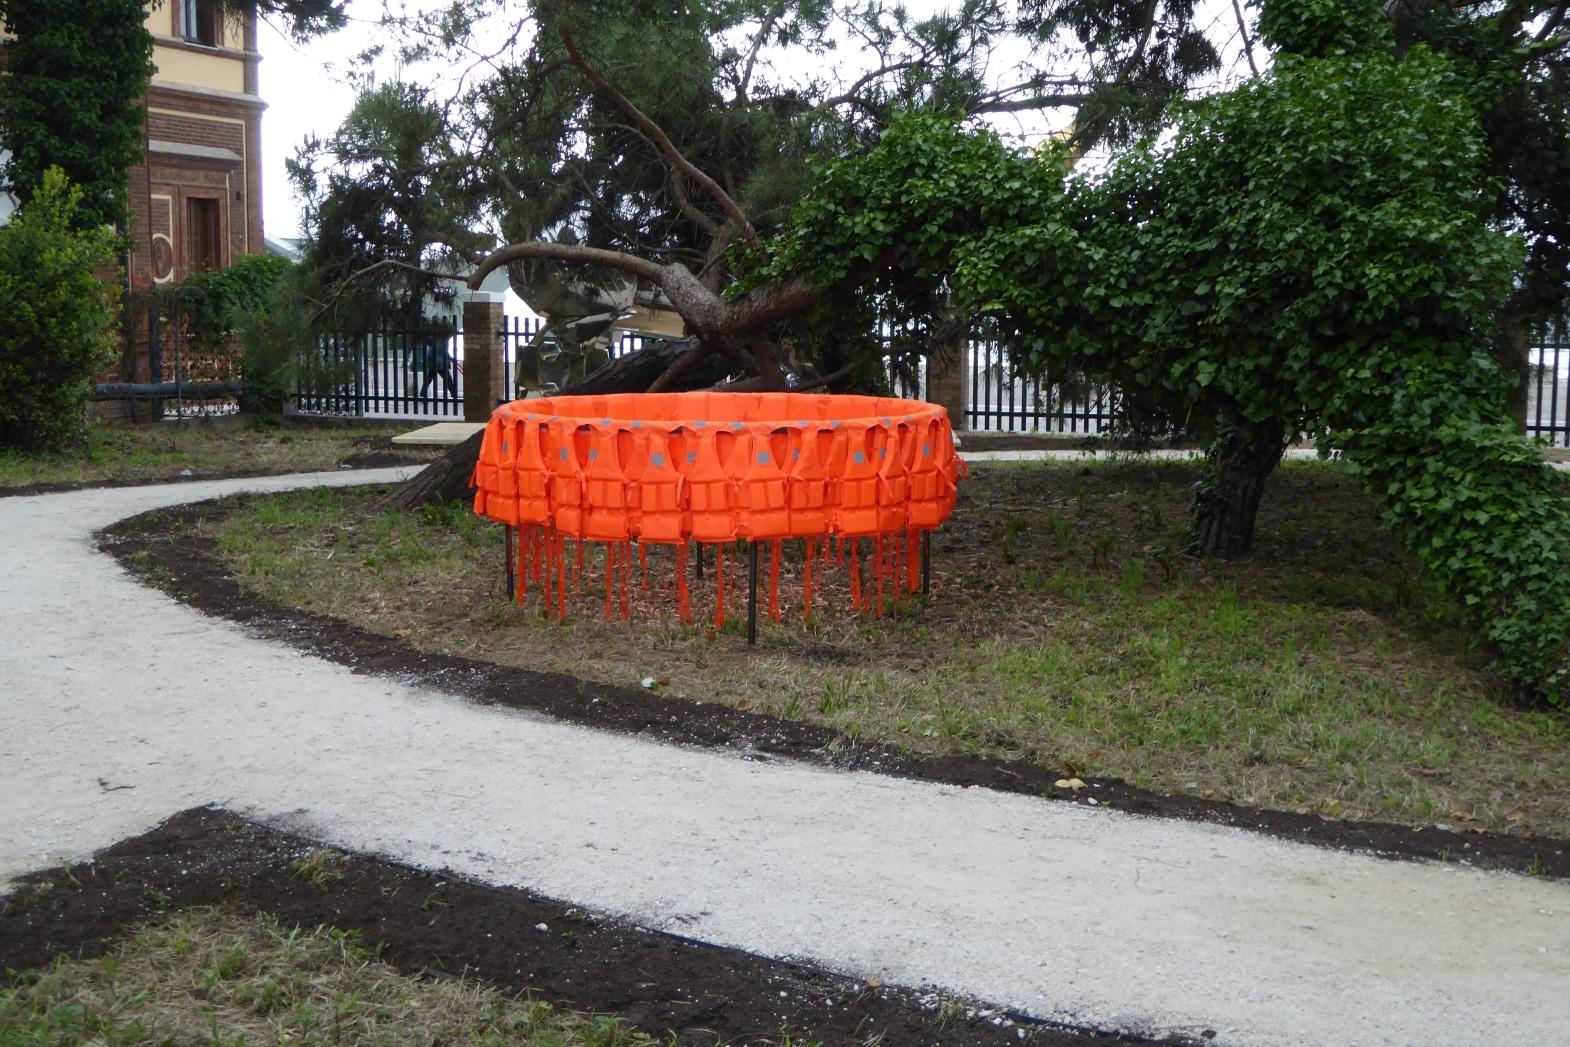 Déplacement (Smuggling Pod), 2017, Life-jackets, Steel, 200 cm diameter x 100 cm, Installation Giardini Marinaressa, Venice ITALY